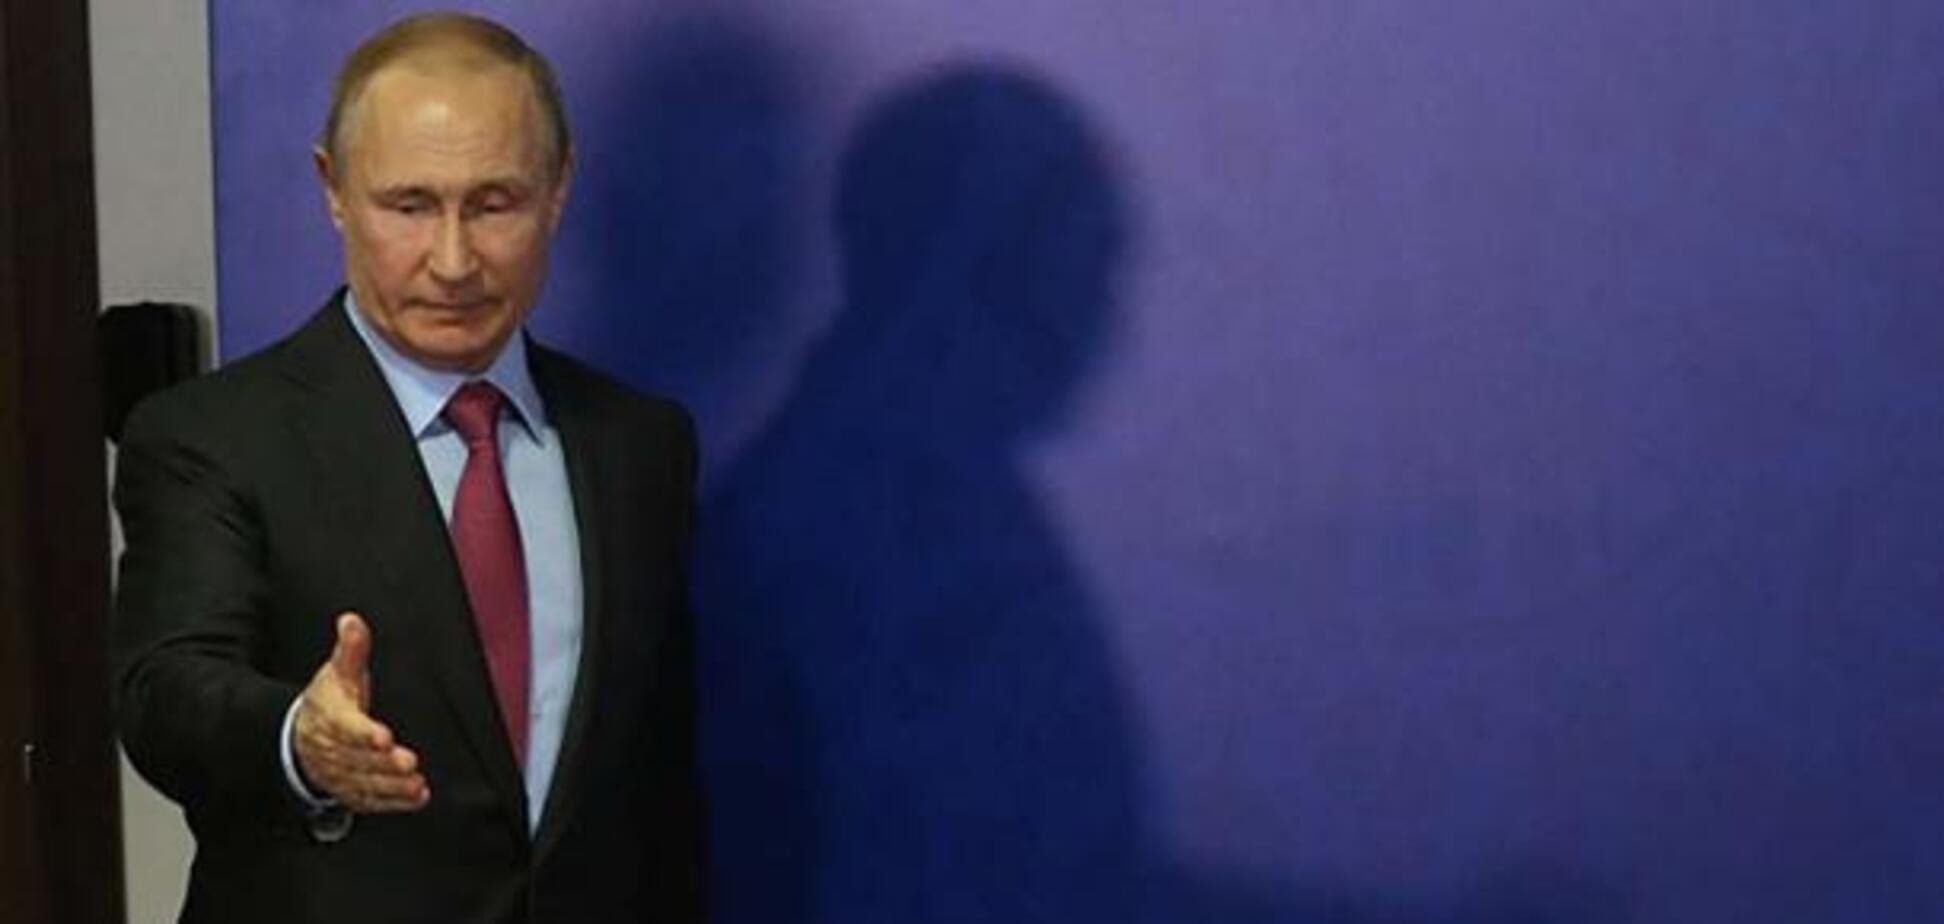 Владимир Путин. Источник: 24 канал